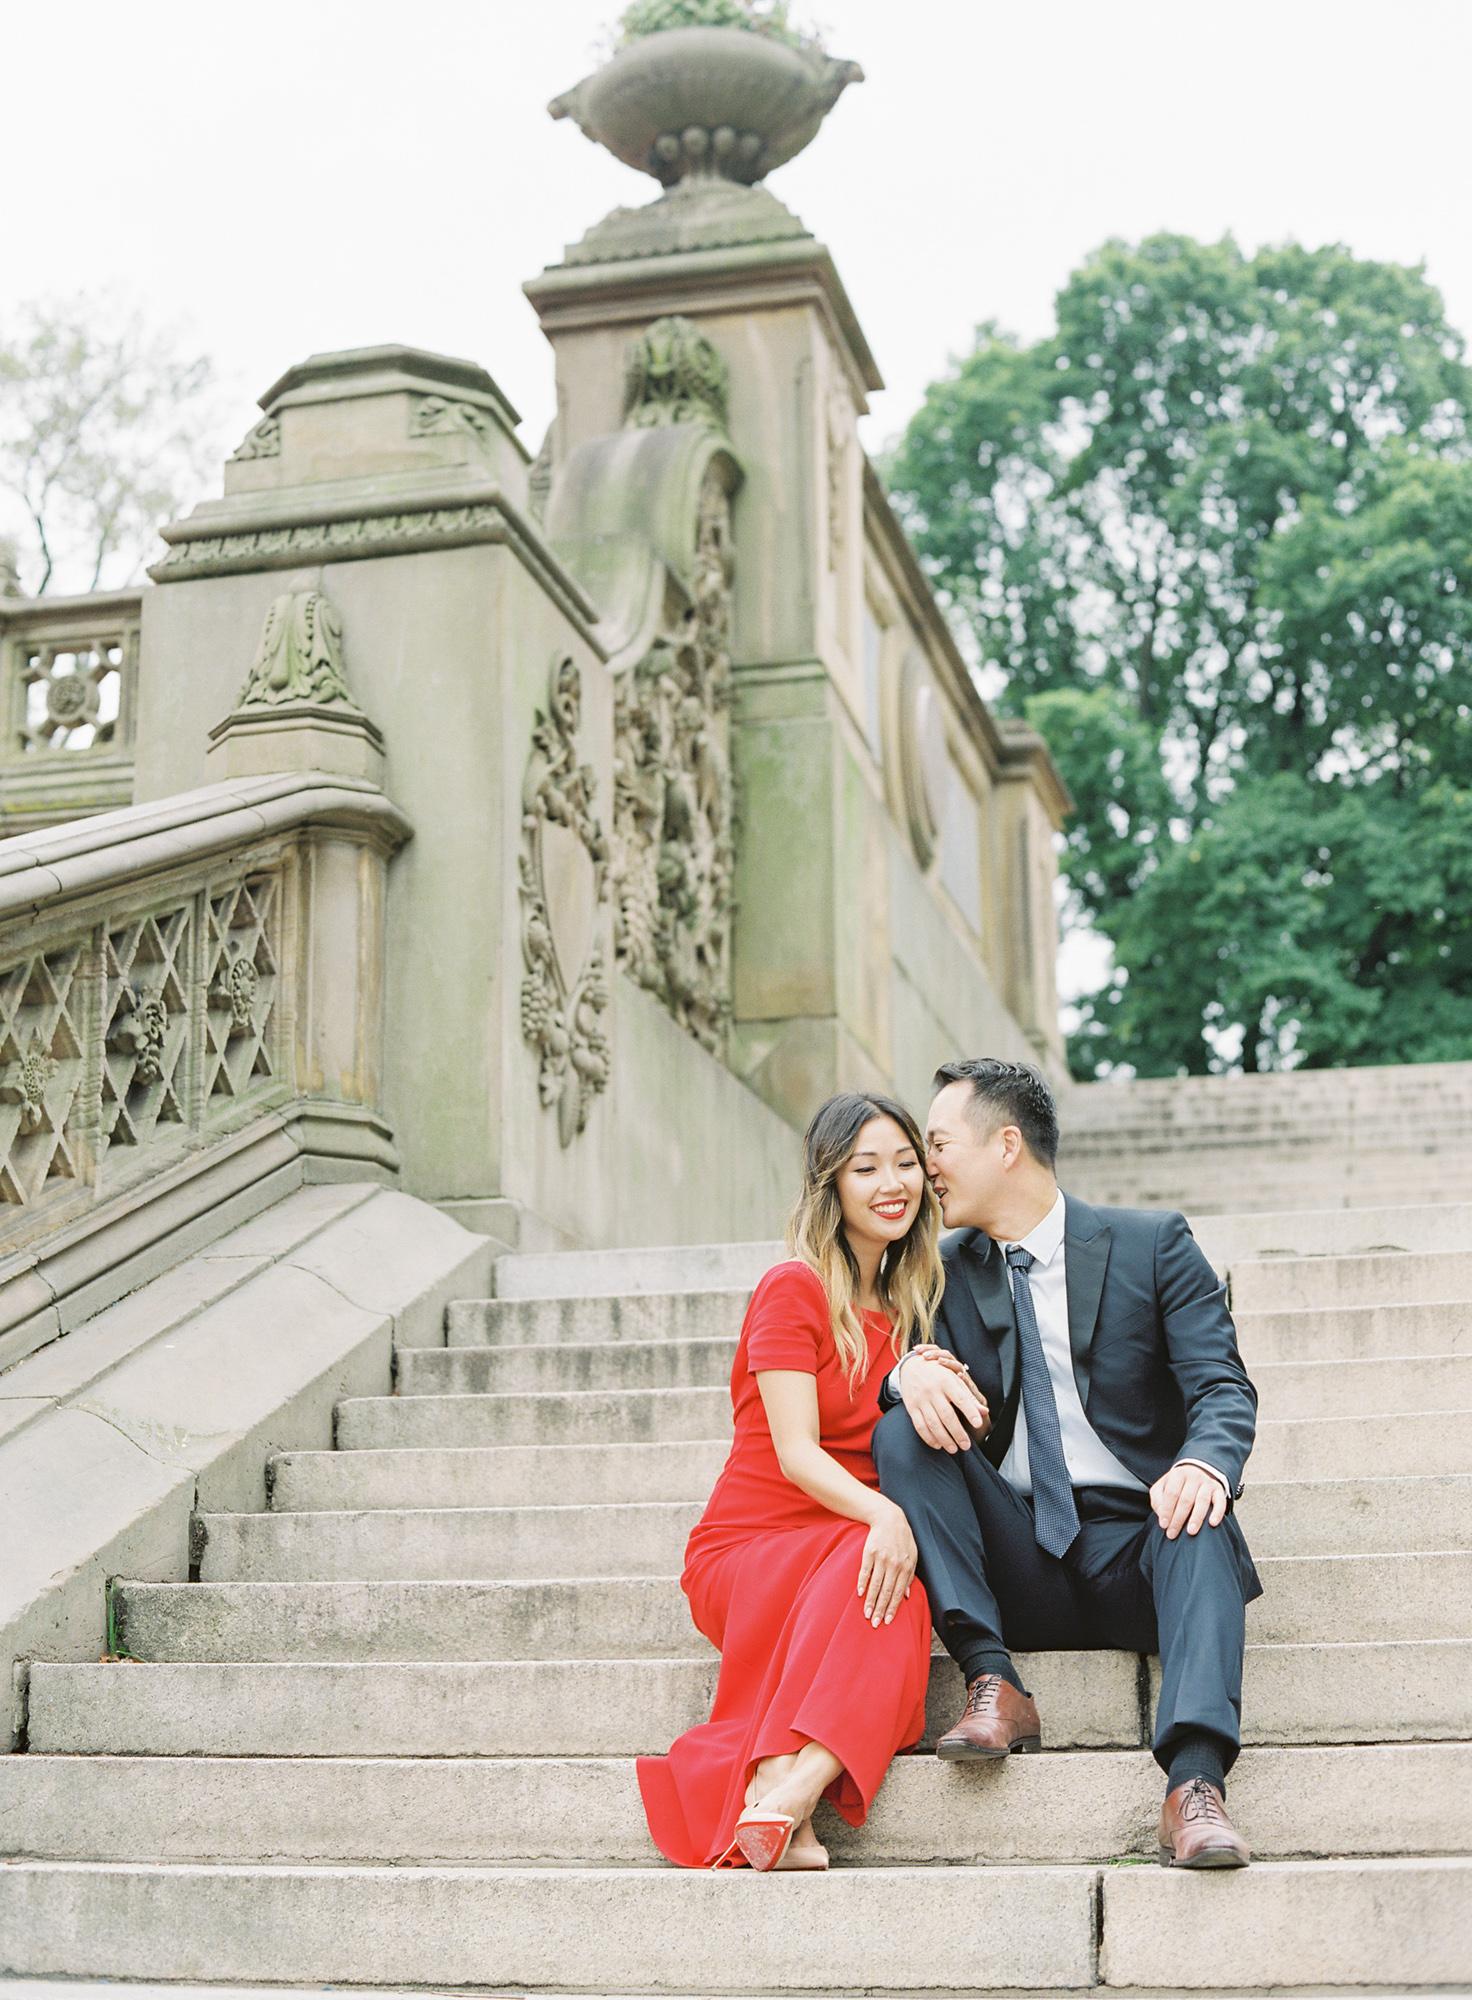 New-York-Film-Engagement-Session-Brooklyn-Bridge-Central-Park-17.jpg